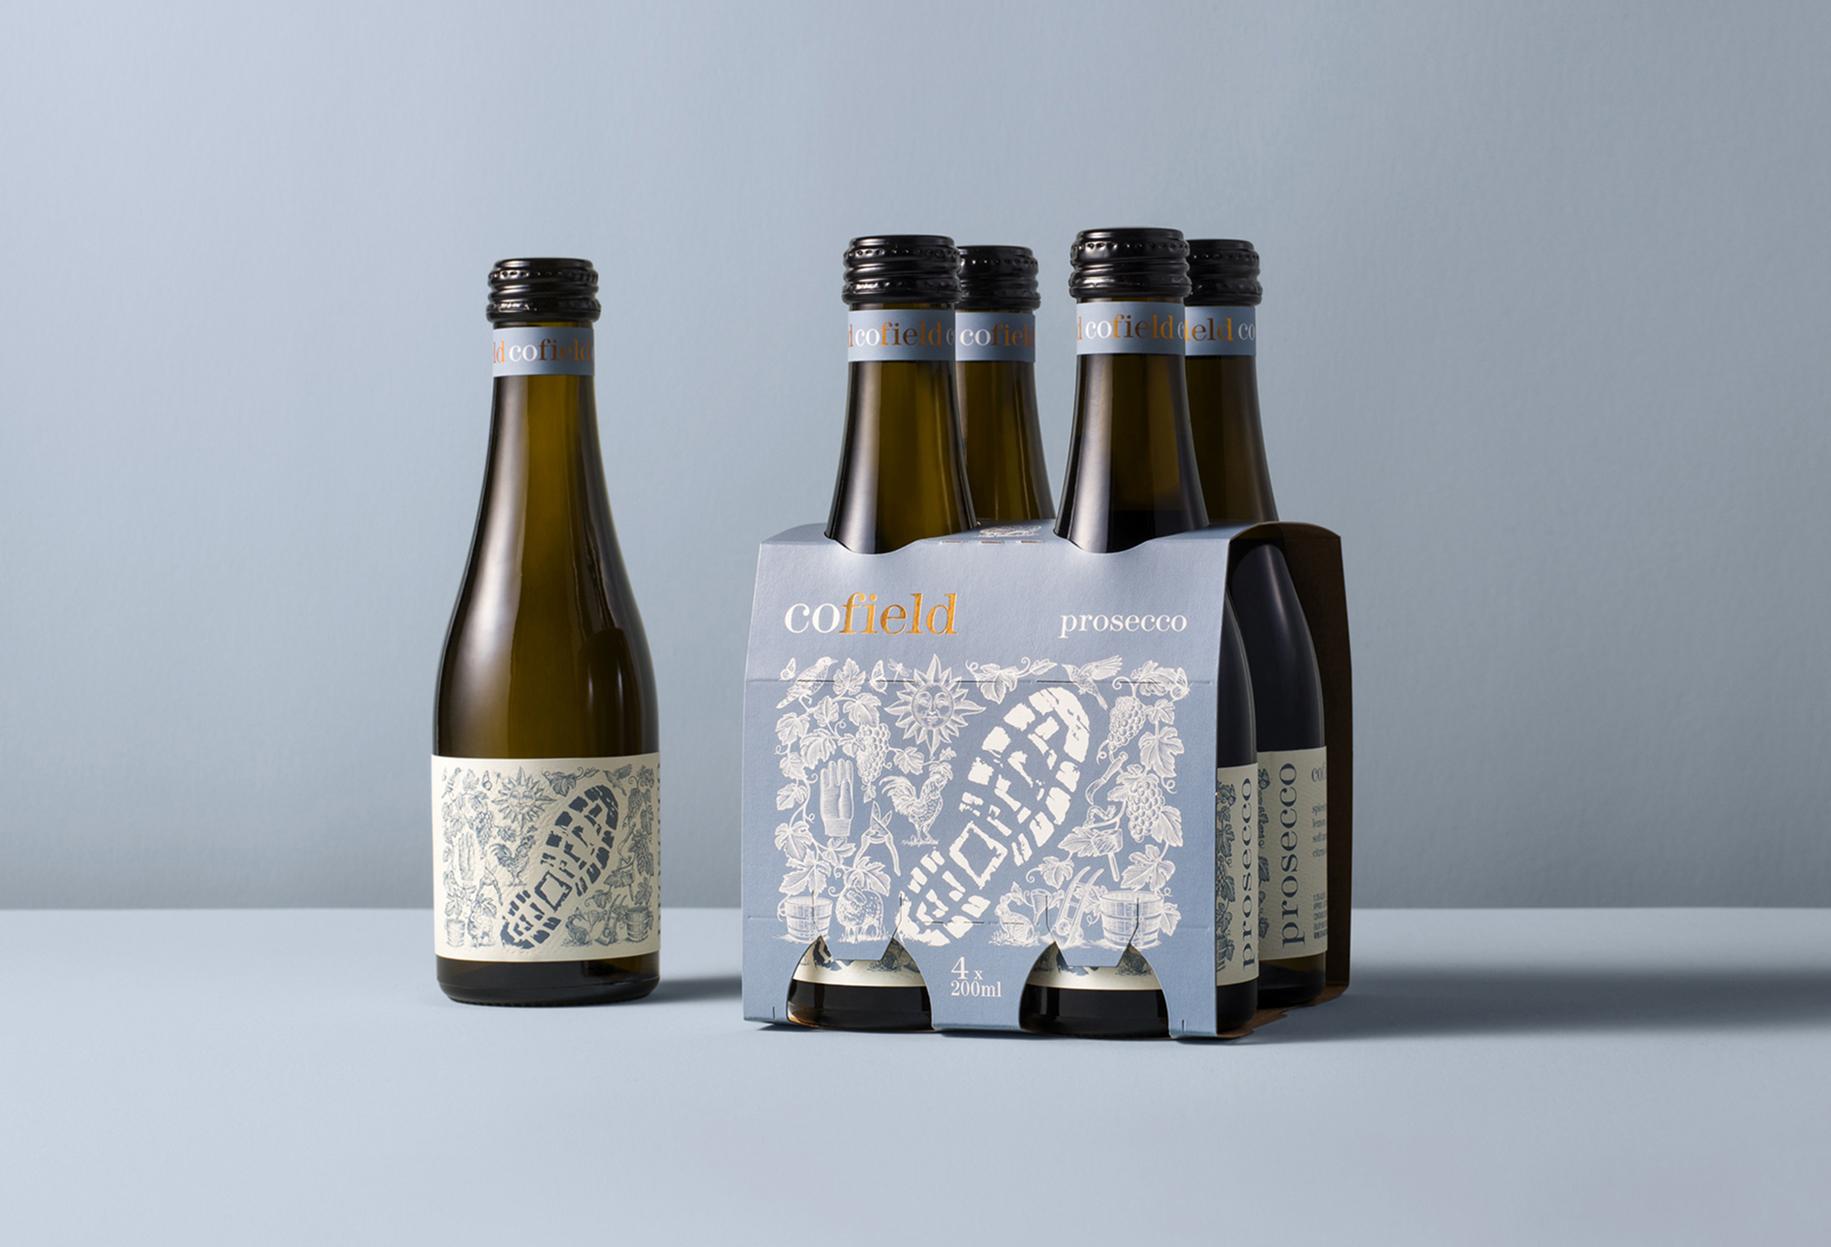 Footsteps Range Packaging Label Design for Cofield Wines